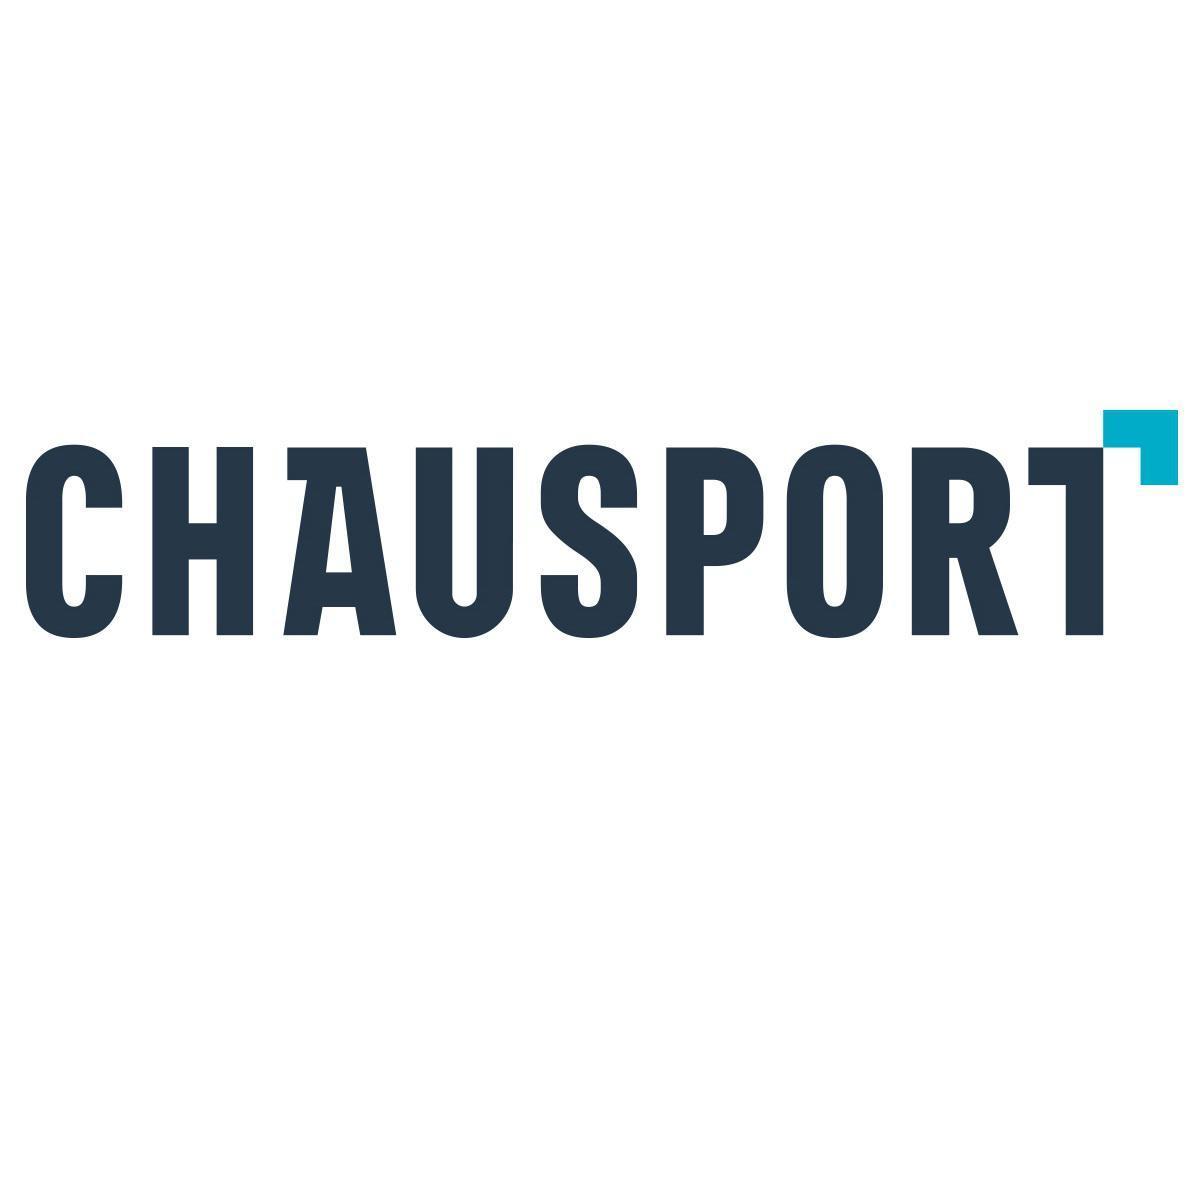 Chausport Petite Forêt